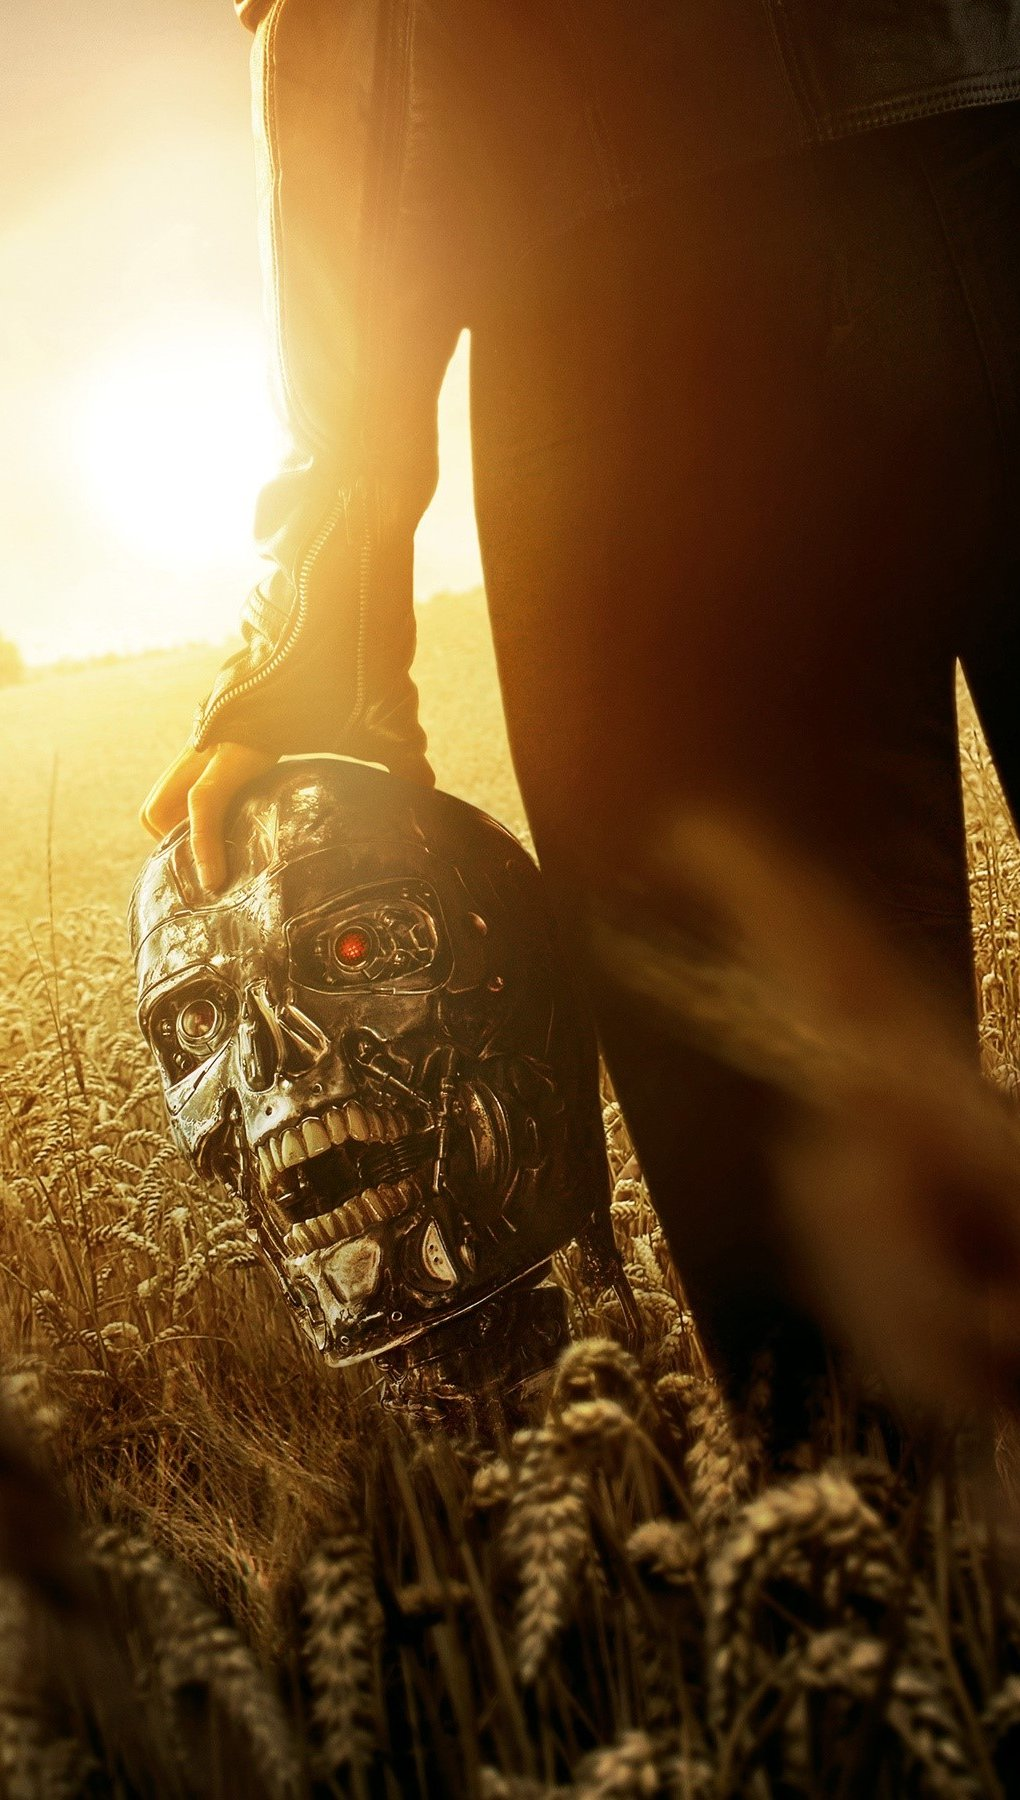 Fondos de pantalla Terminator El Génesis Vertical